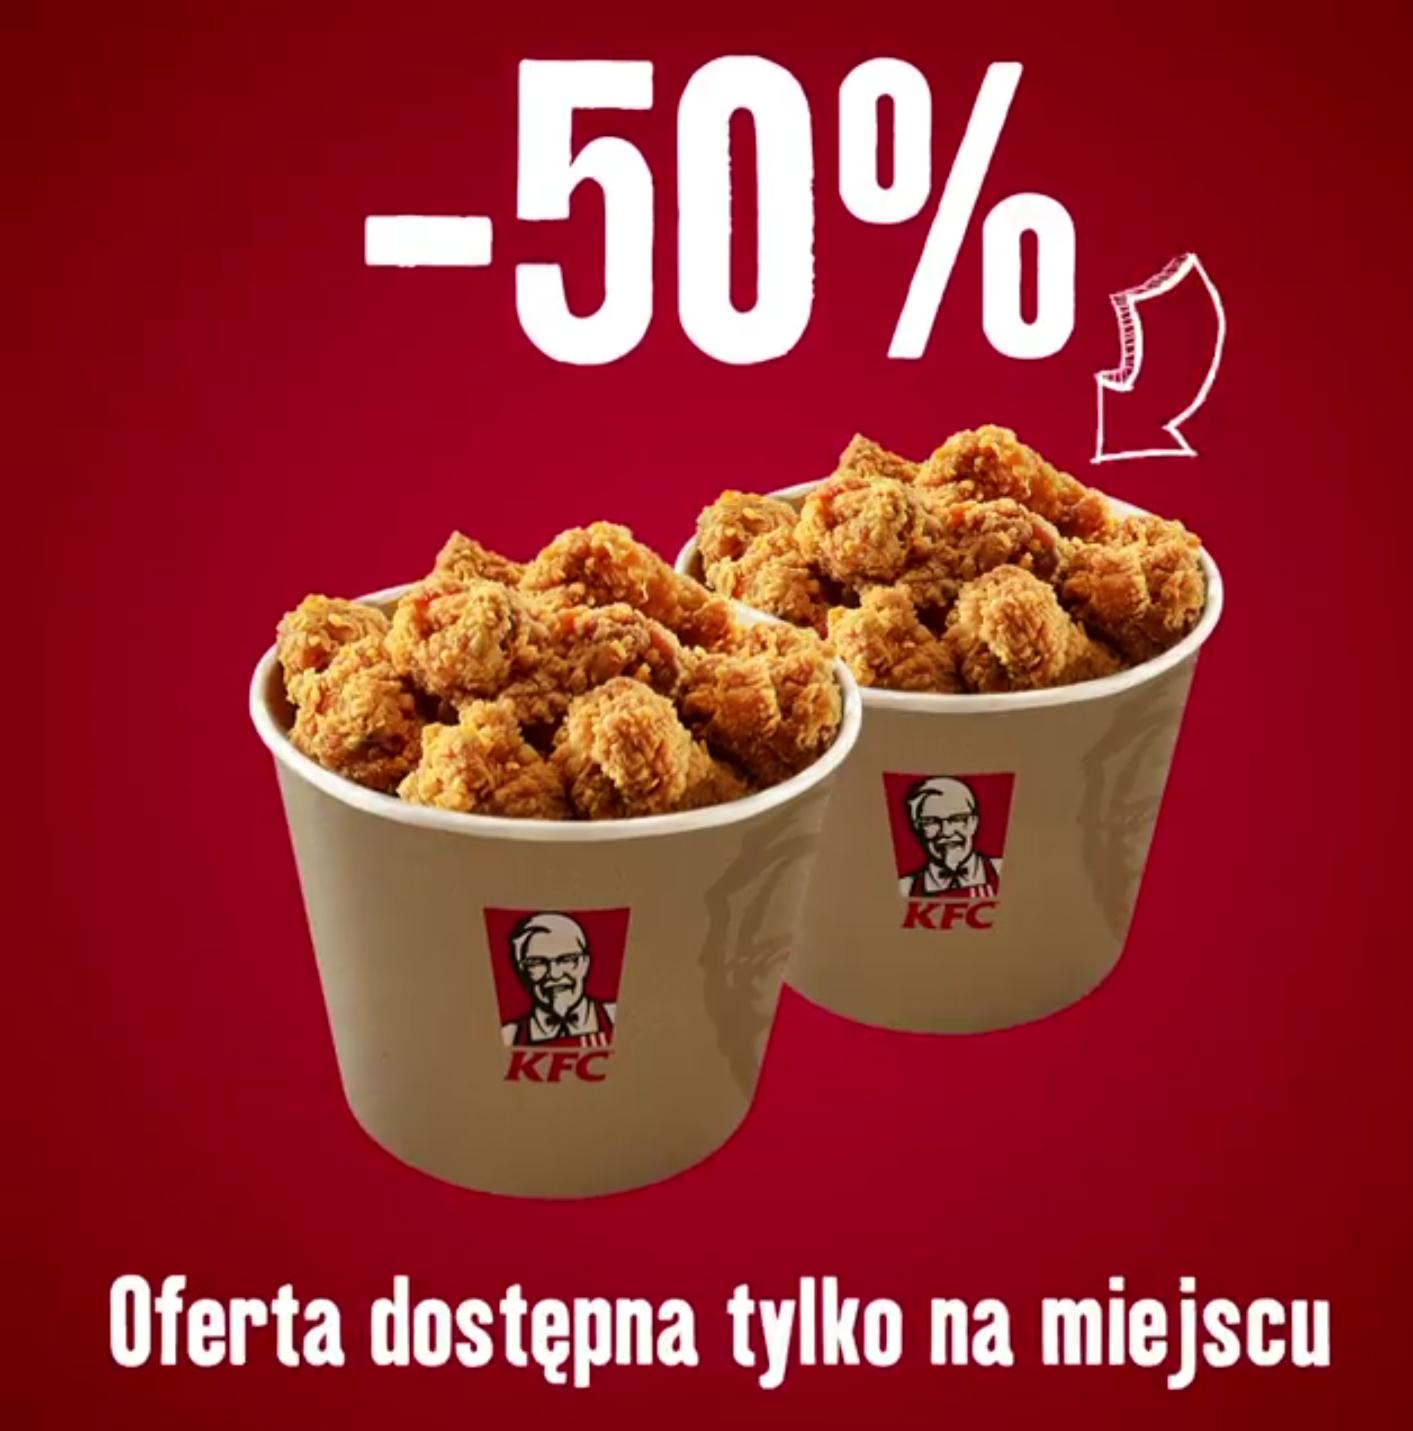 Drugi kubełek -50% !! @ KFC